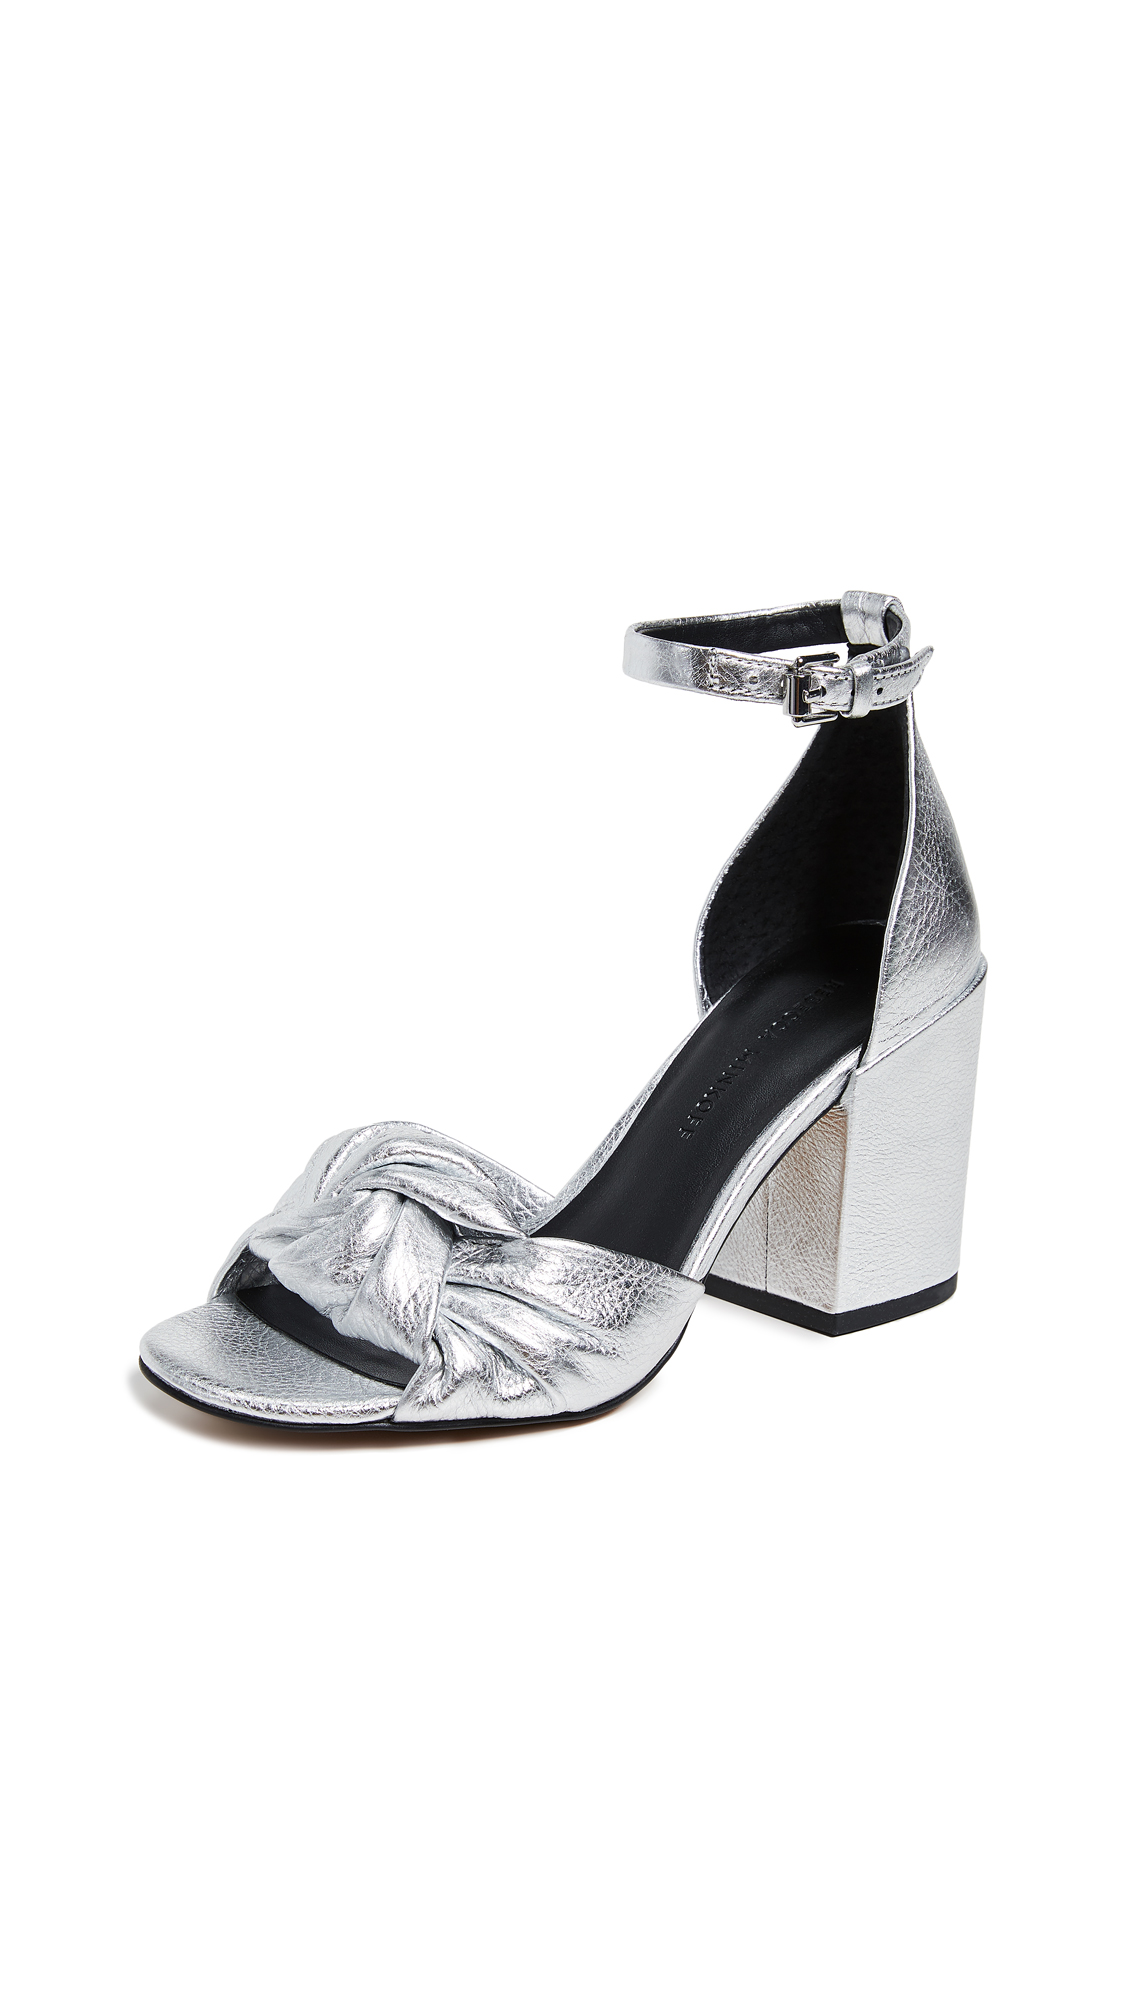 fad537d7baa Rebecca Minkoff Women S Capriana Block-Heel Sandals In Silver